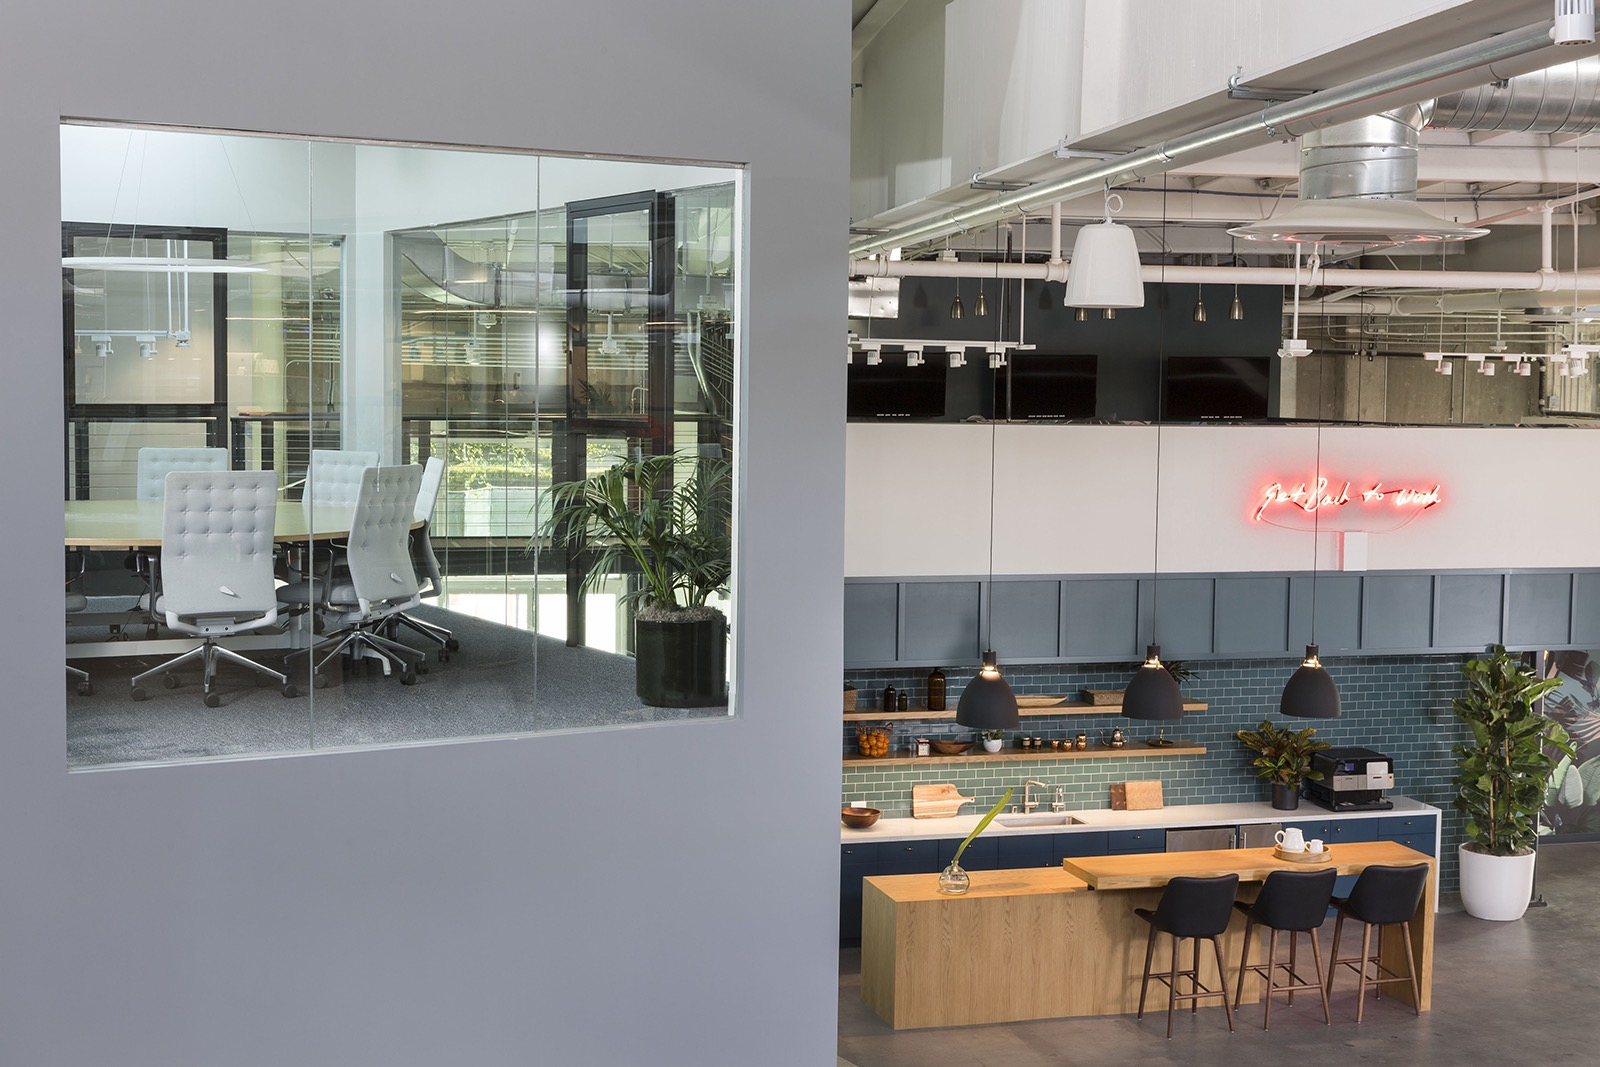 dollar-shave-club-office-3